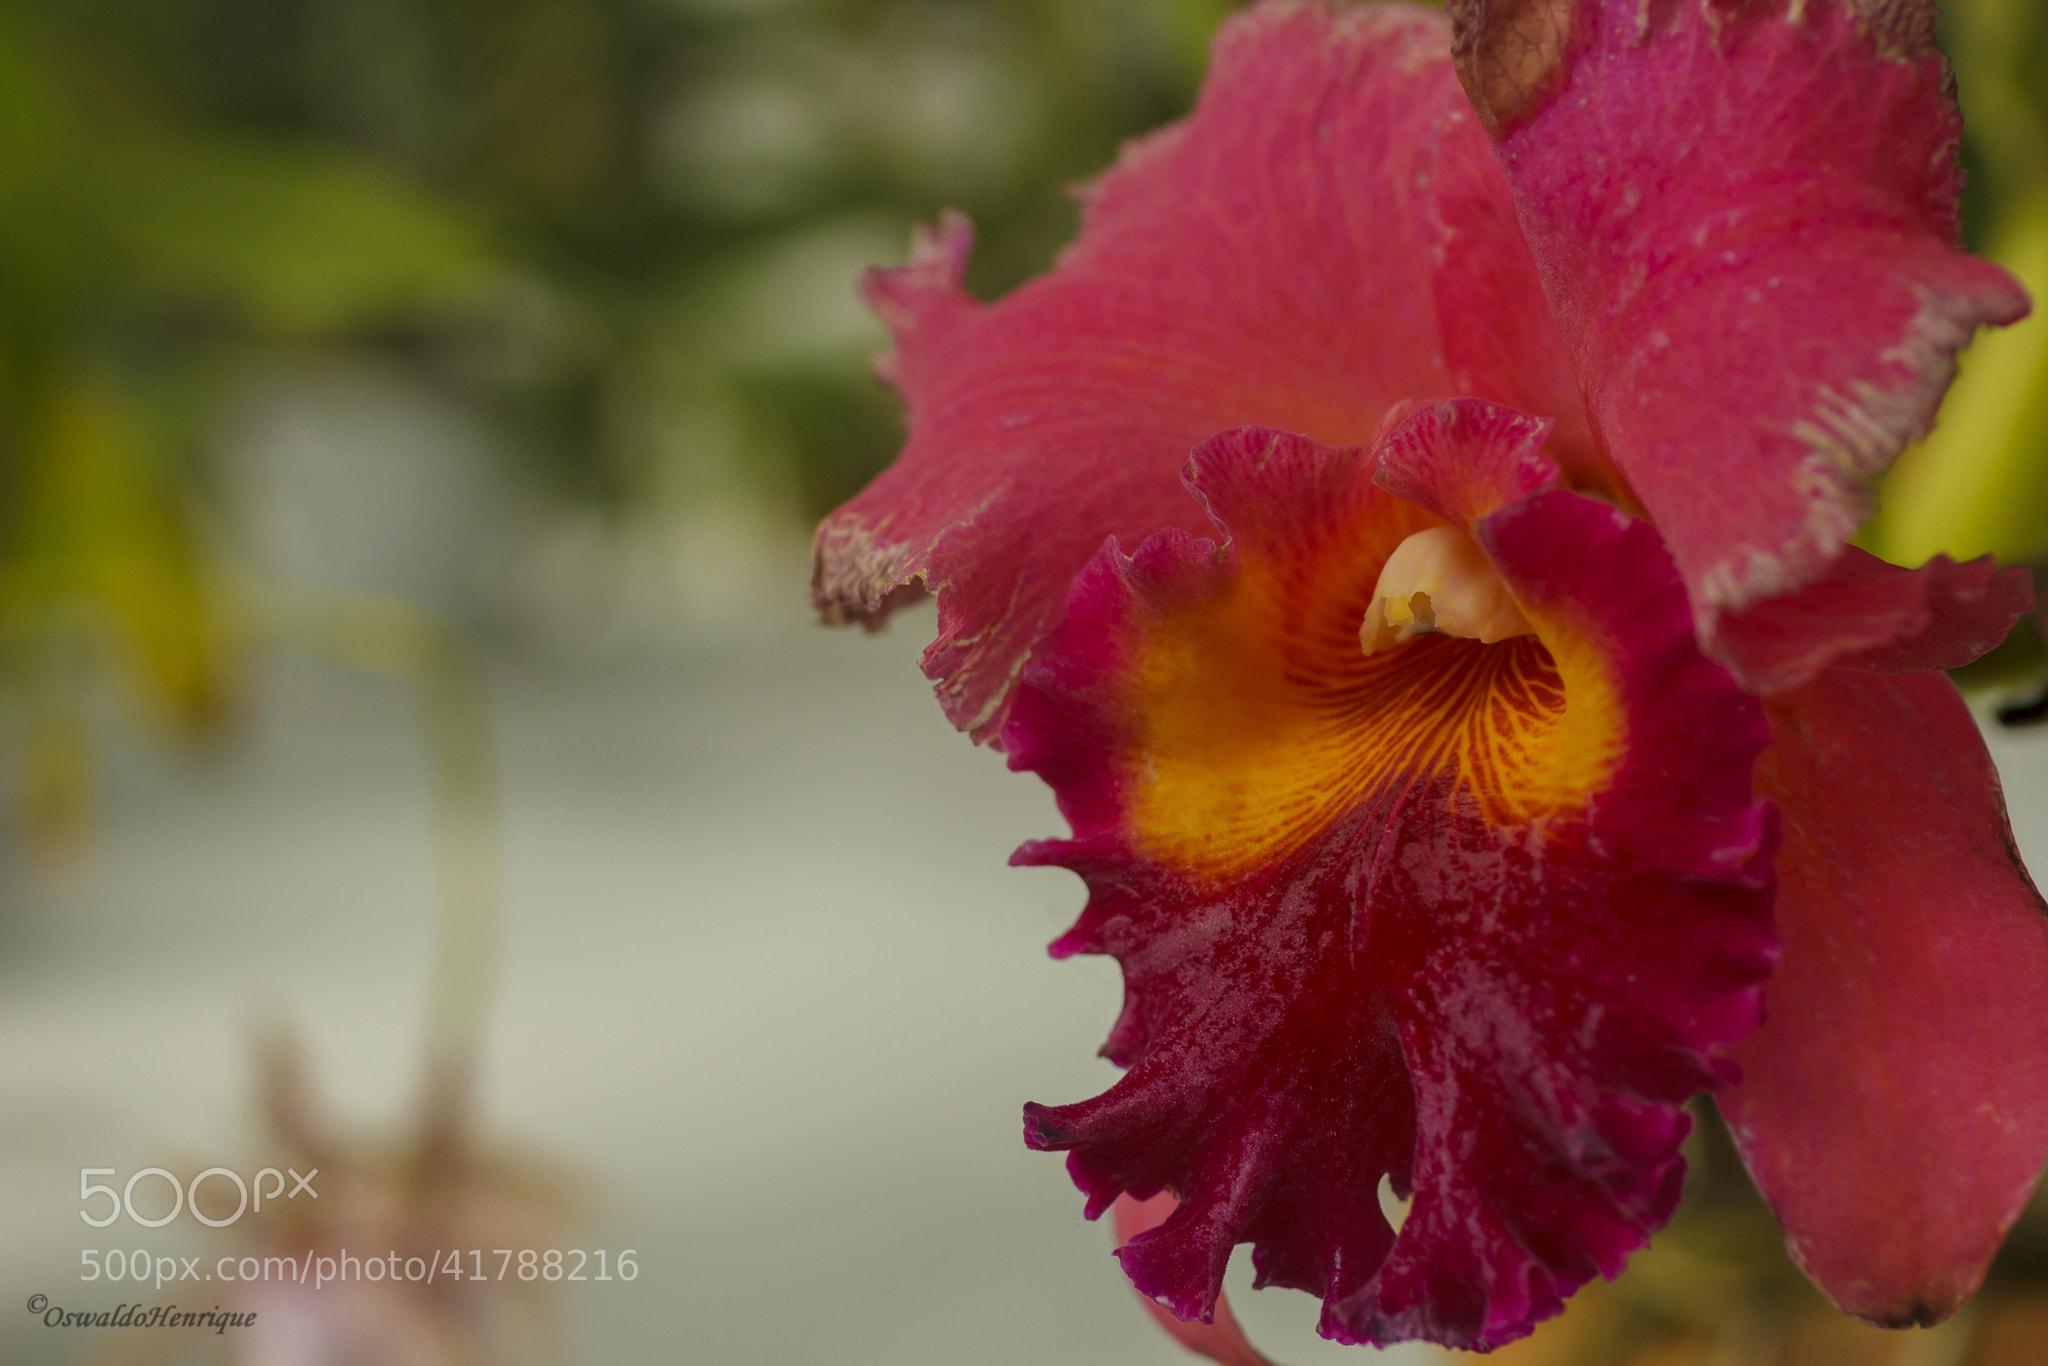 Photograph Velha orquídea by Oswaldo Henrique on 500px